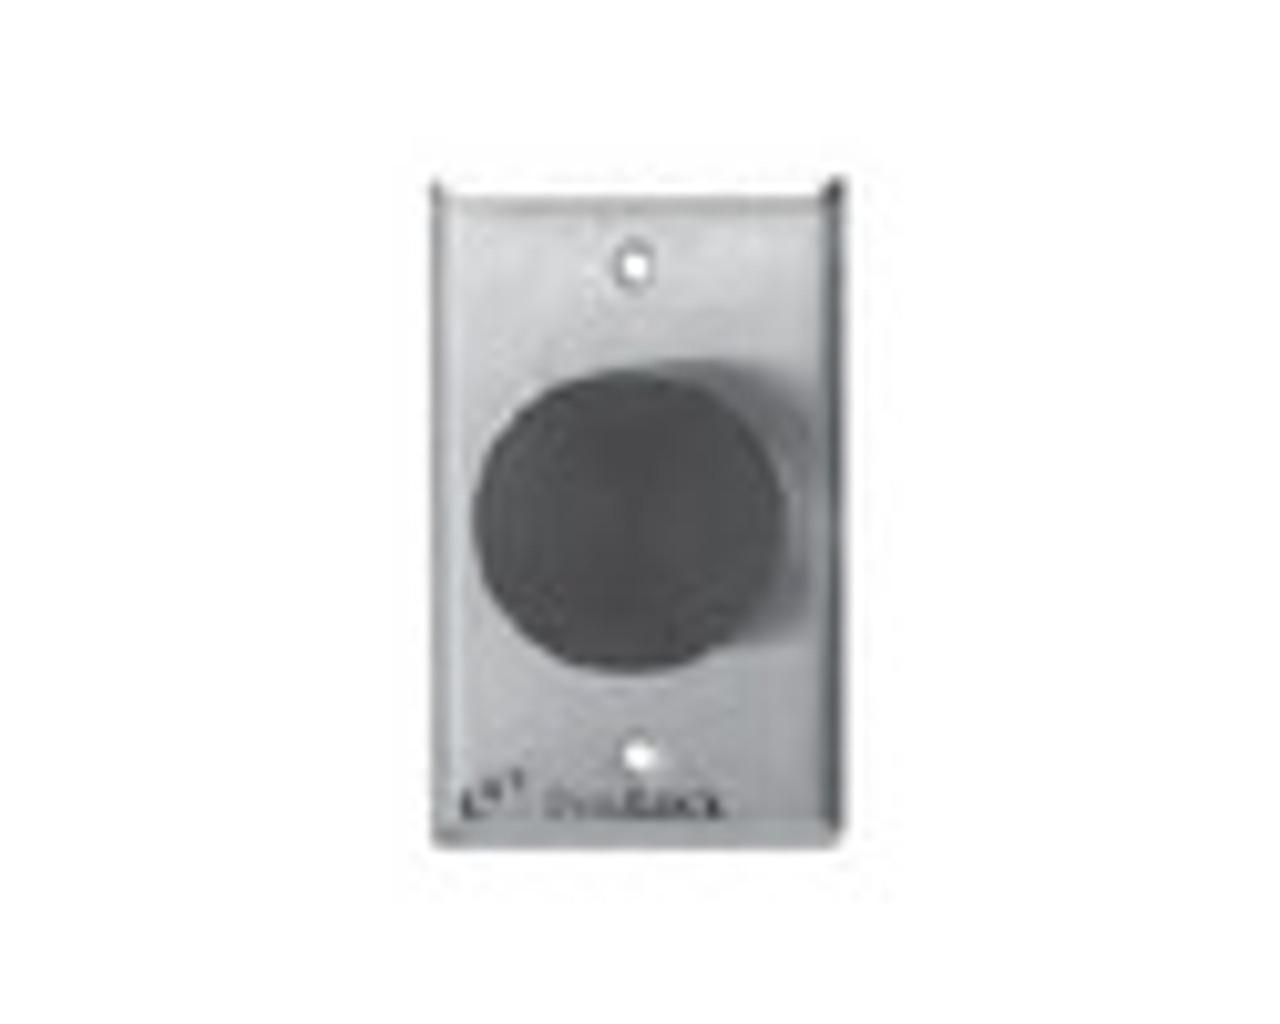 2280-US26 DynaLock 2280 Series Single SlimLine Electromagnetic Lock for Outswing Door in Bright Chrome